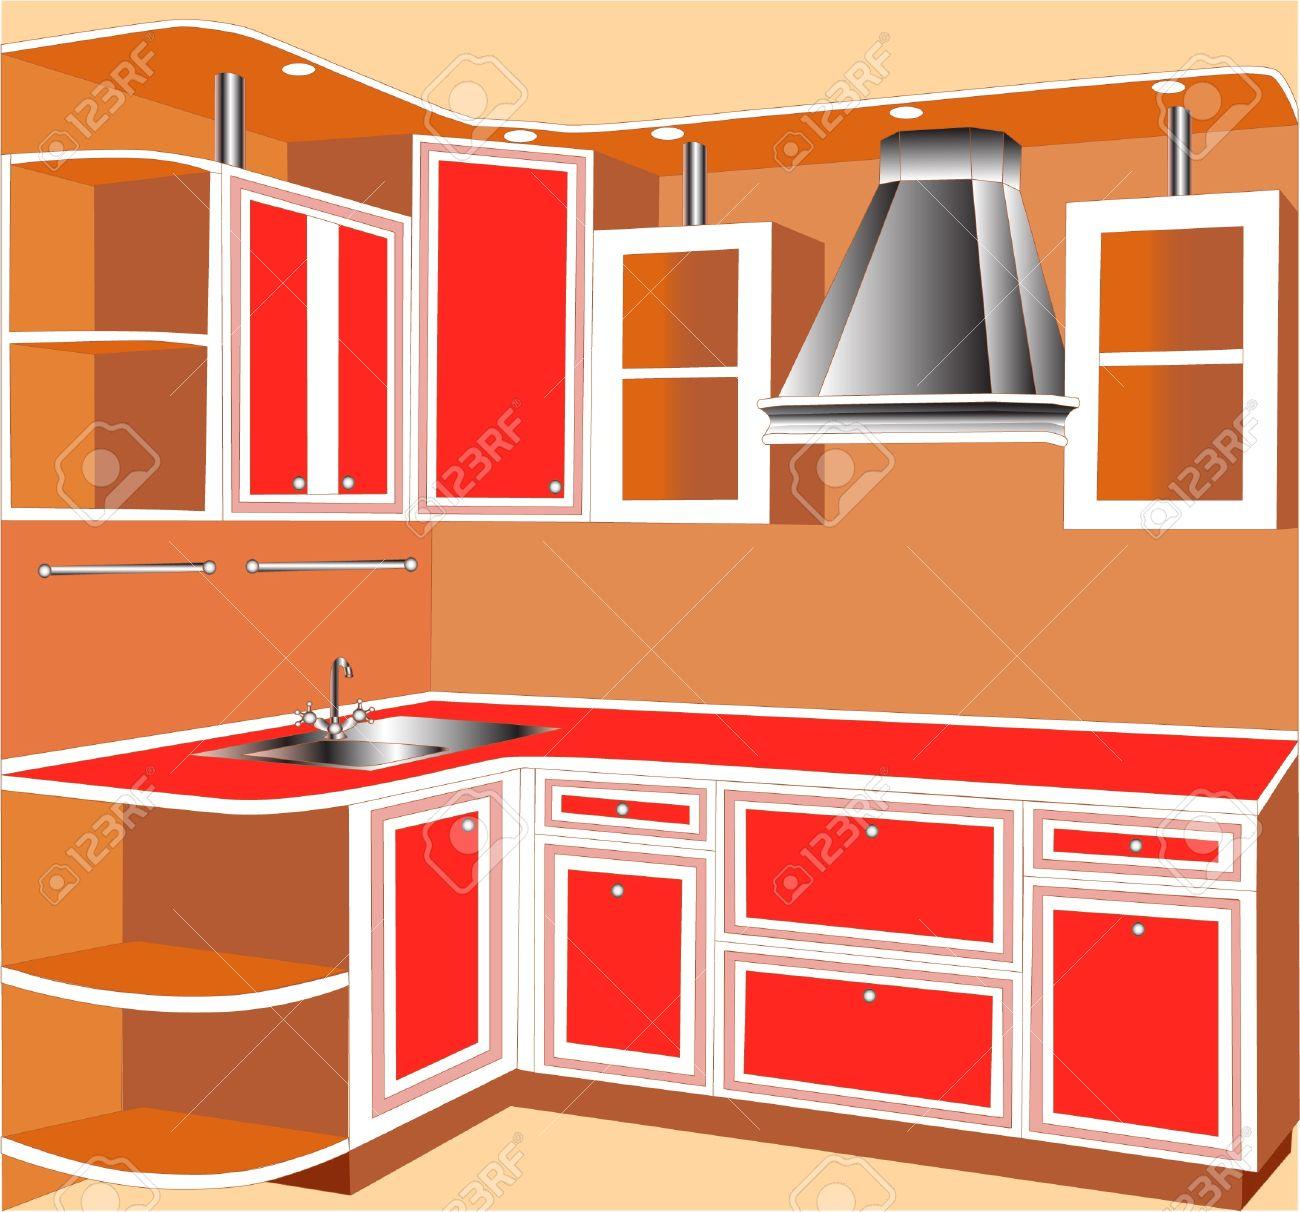 Colori Per Mobili Cucina. Excellent Ikea Accessori Cassetti Cucina ...